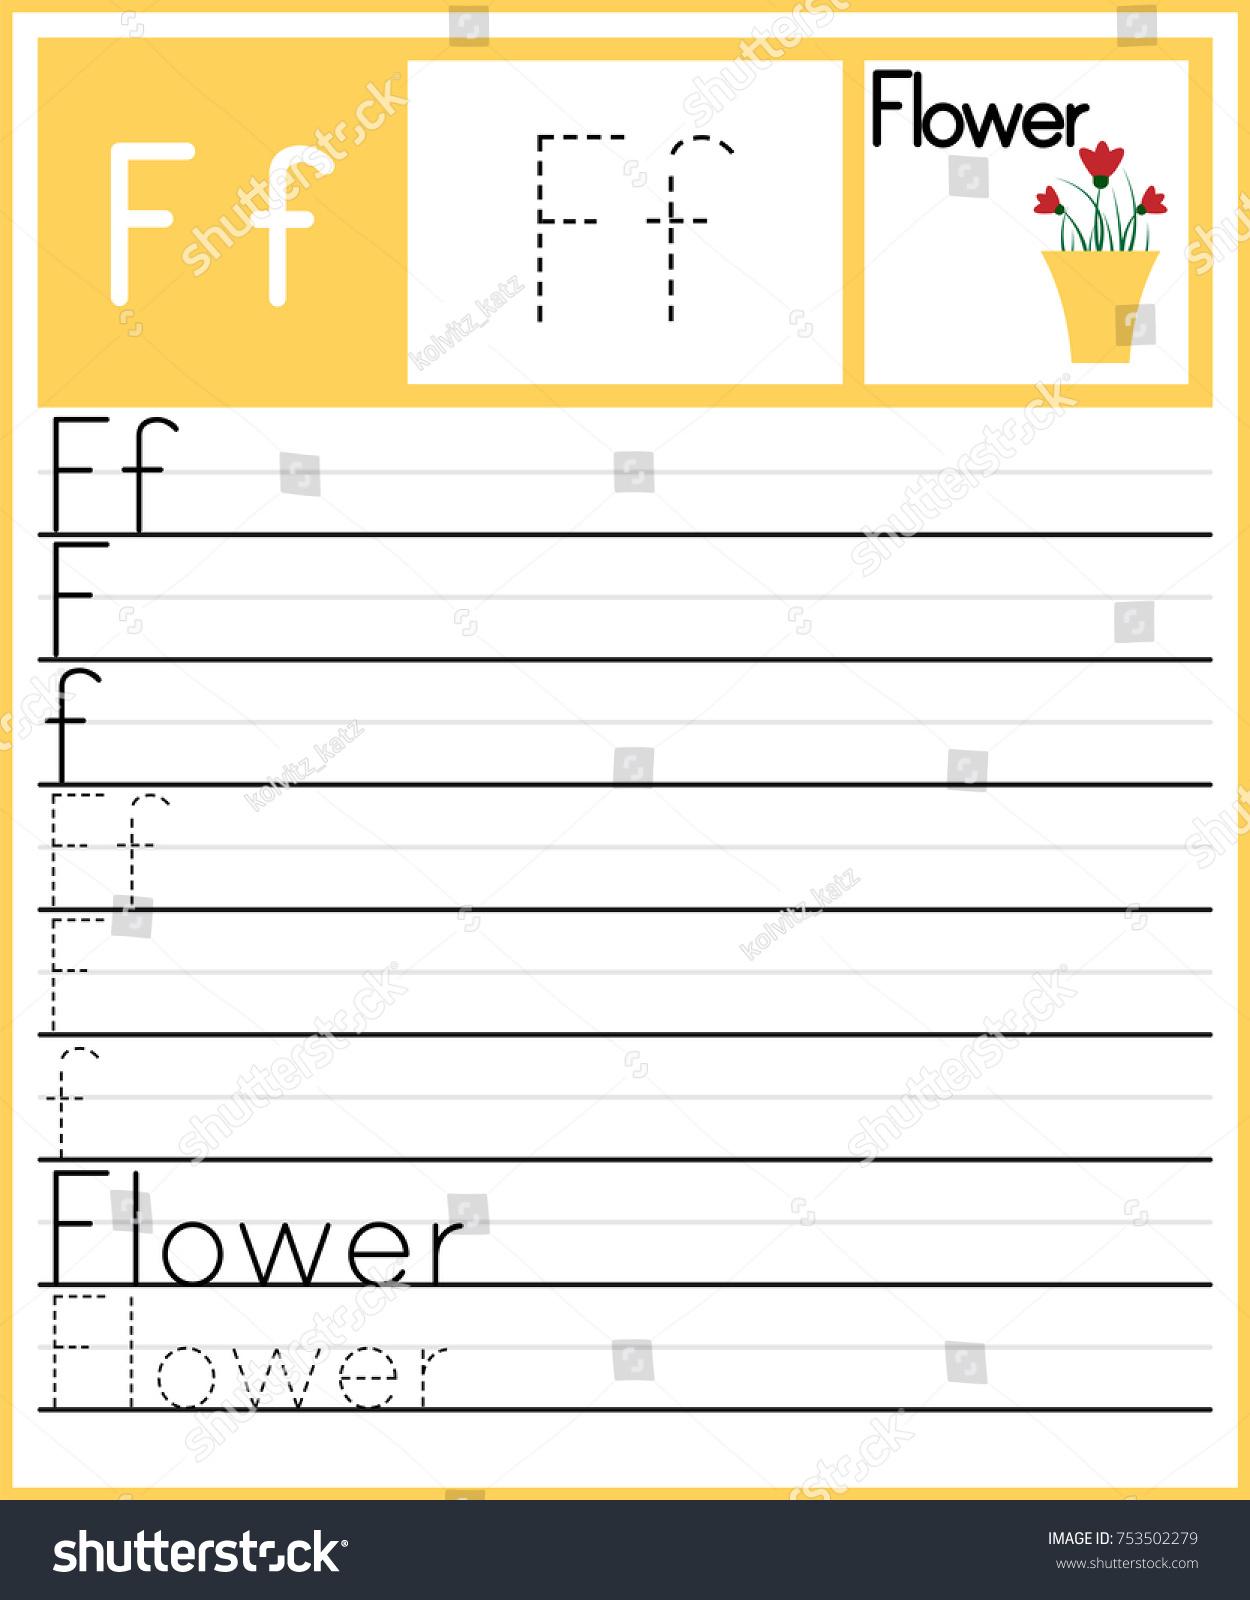 Kindergarten In Spanish Letter F Worksheet Kindergarten Best Free Printable Worksheets